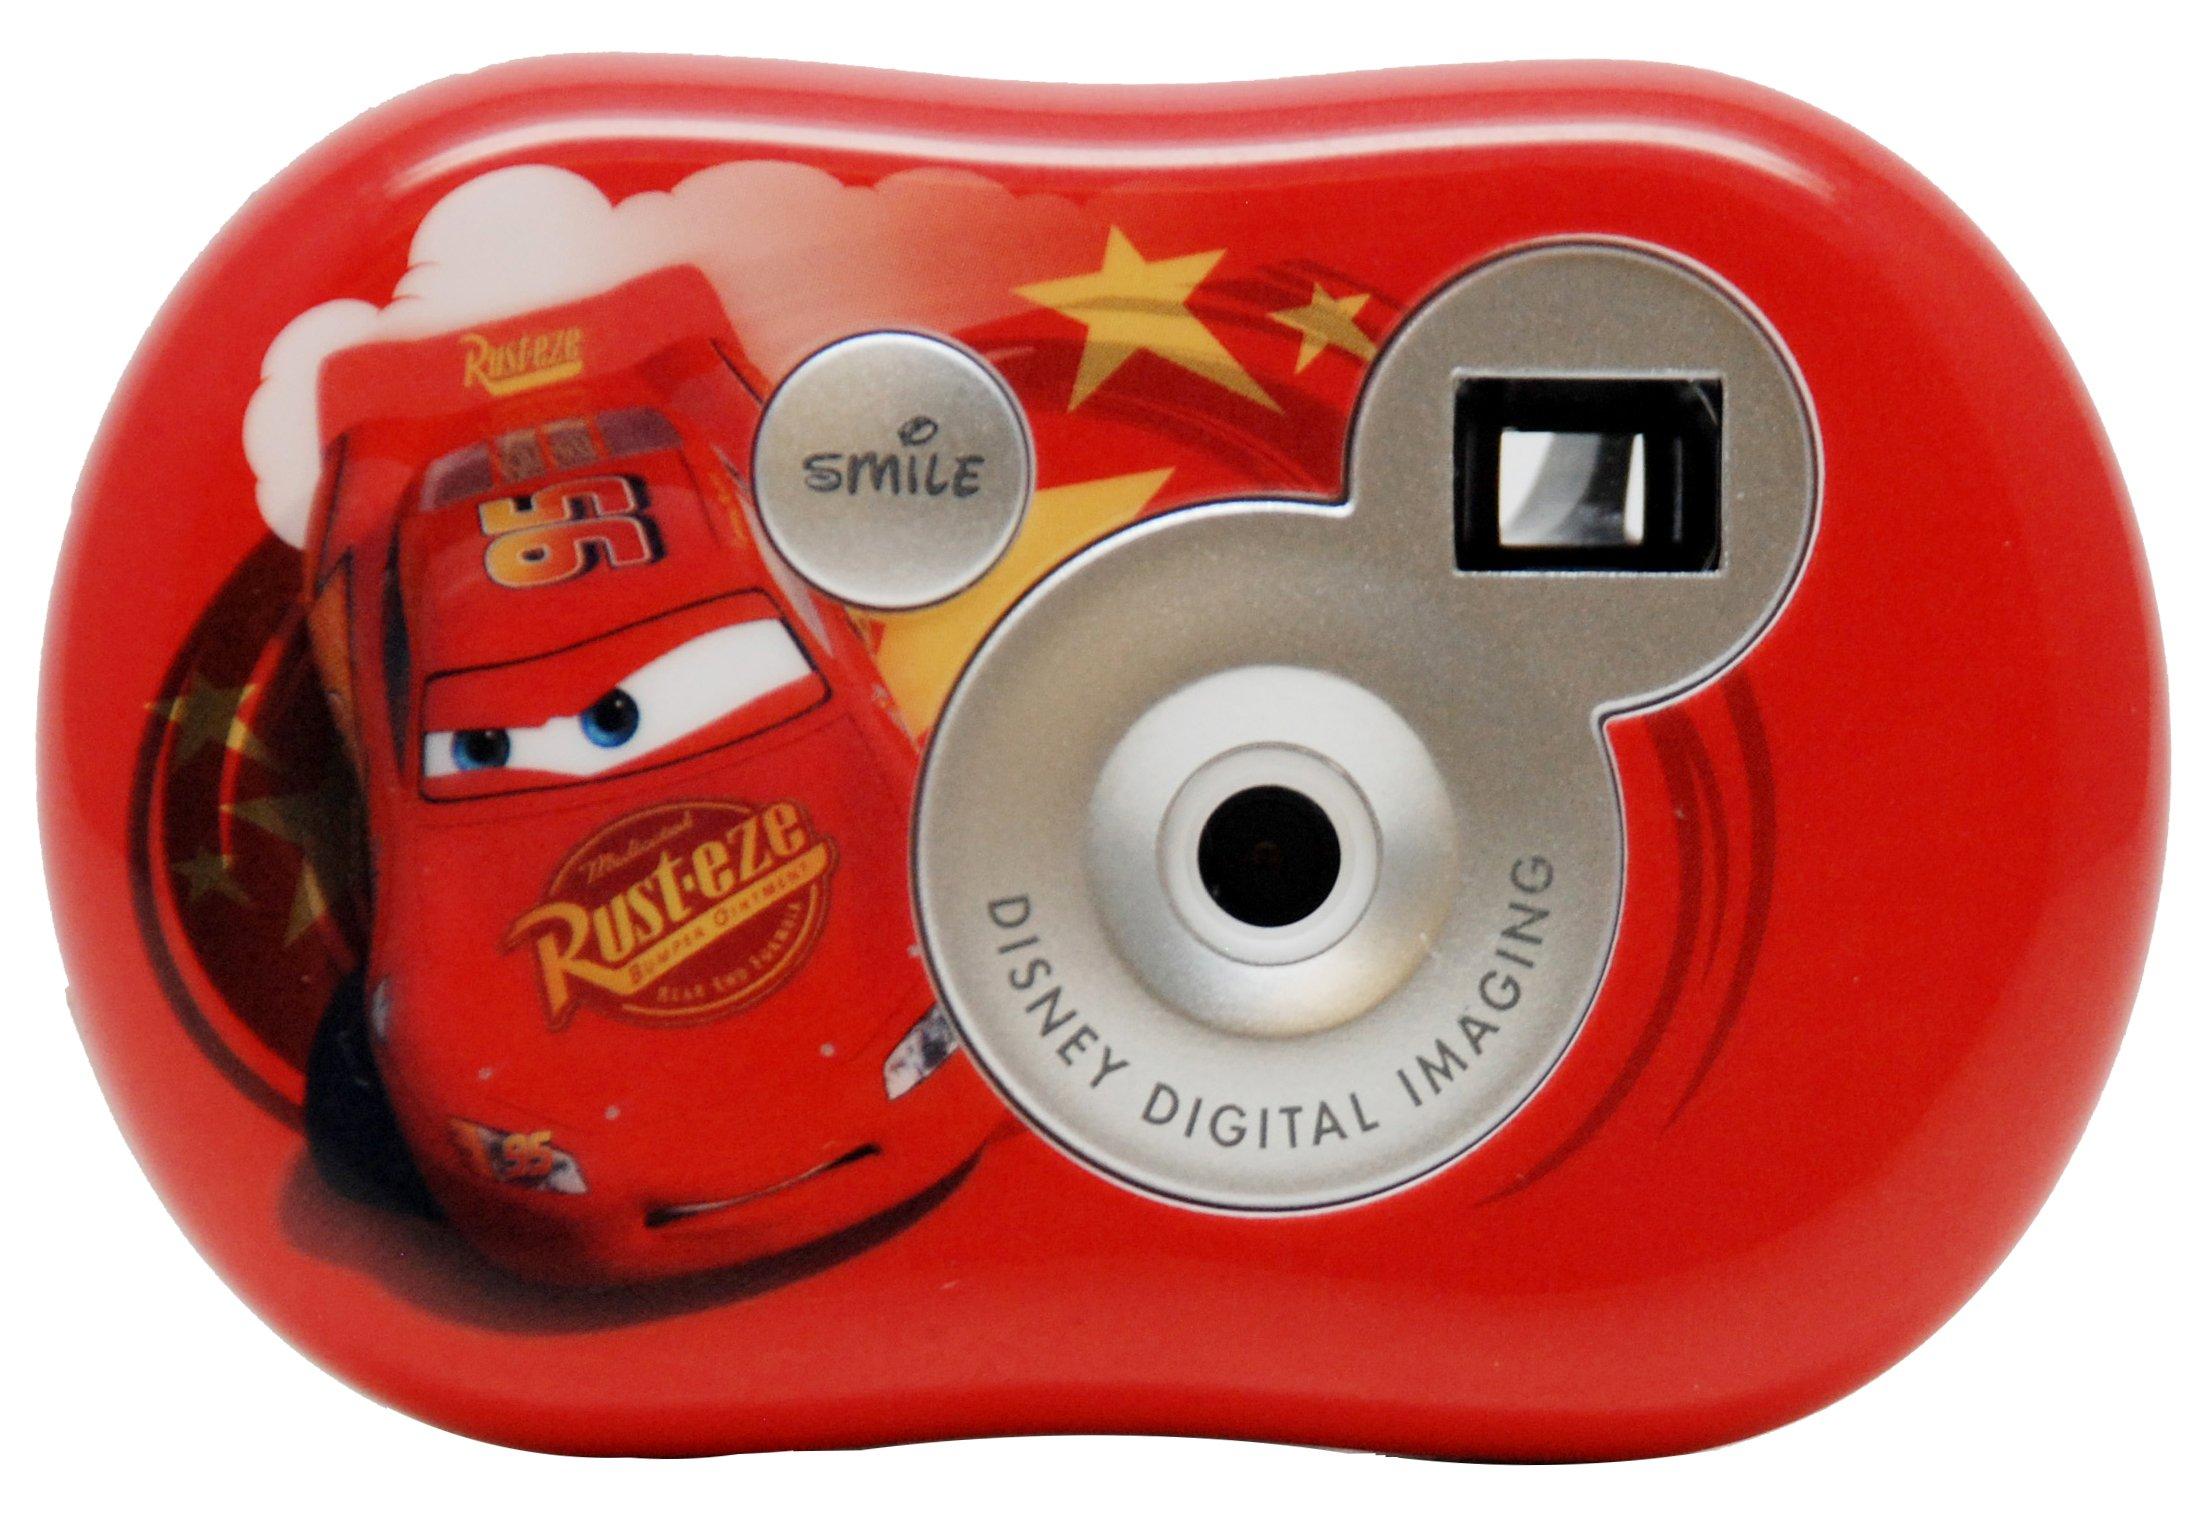 Digital Blue Disney Pix Micro Camera Creativity Kit - Cars by Digital Blue (Image #2)